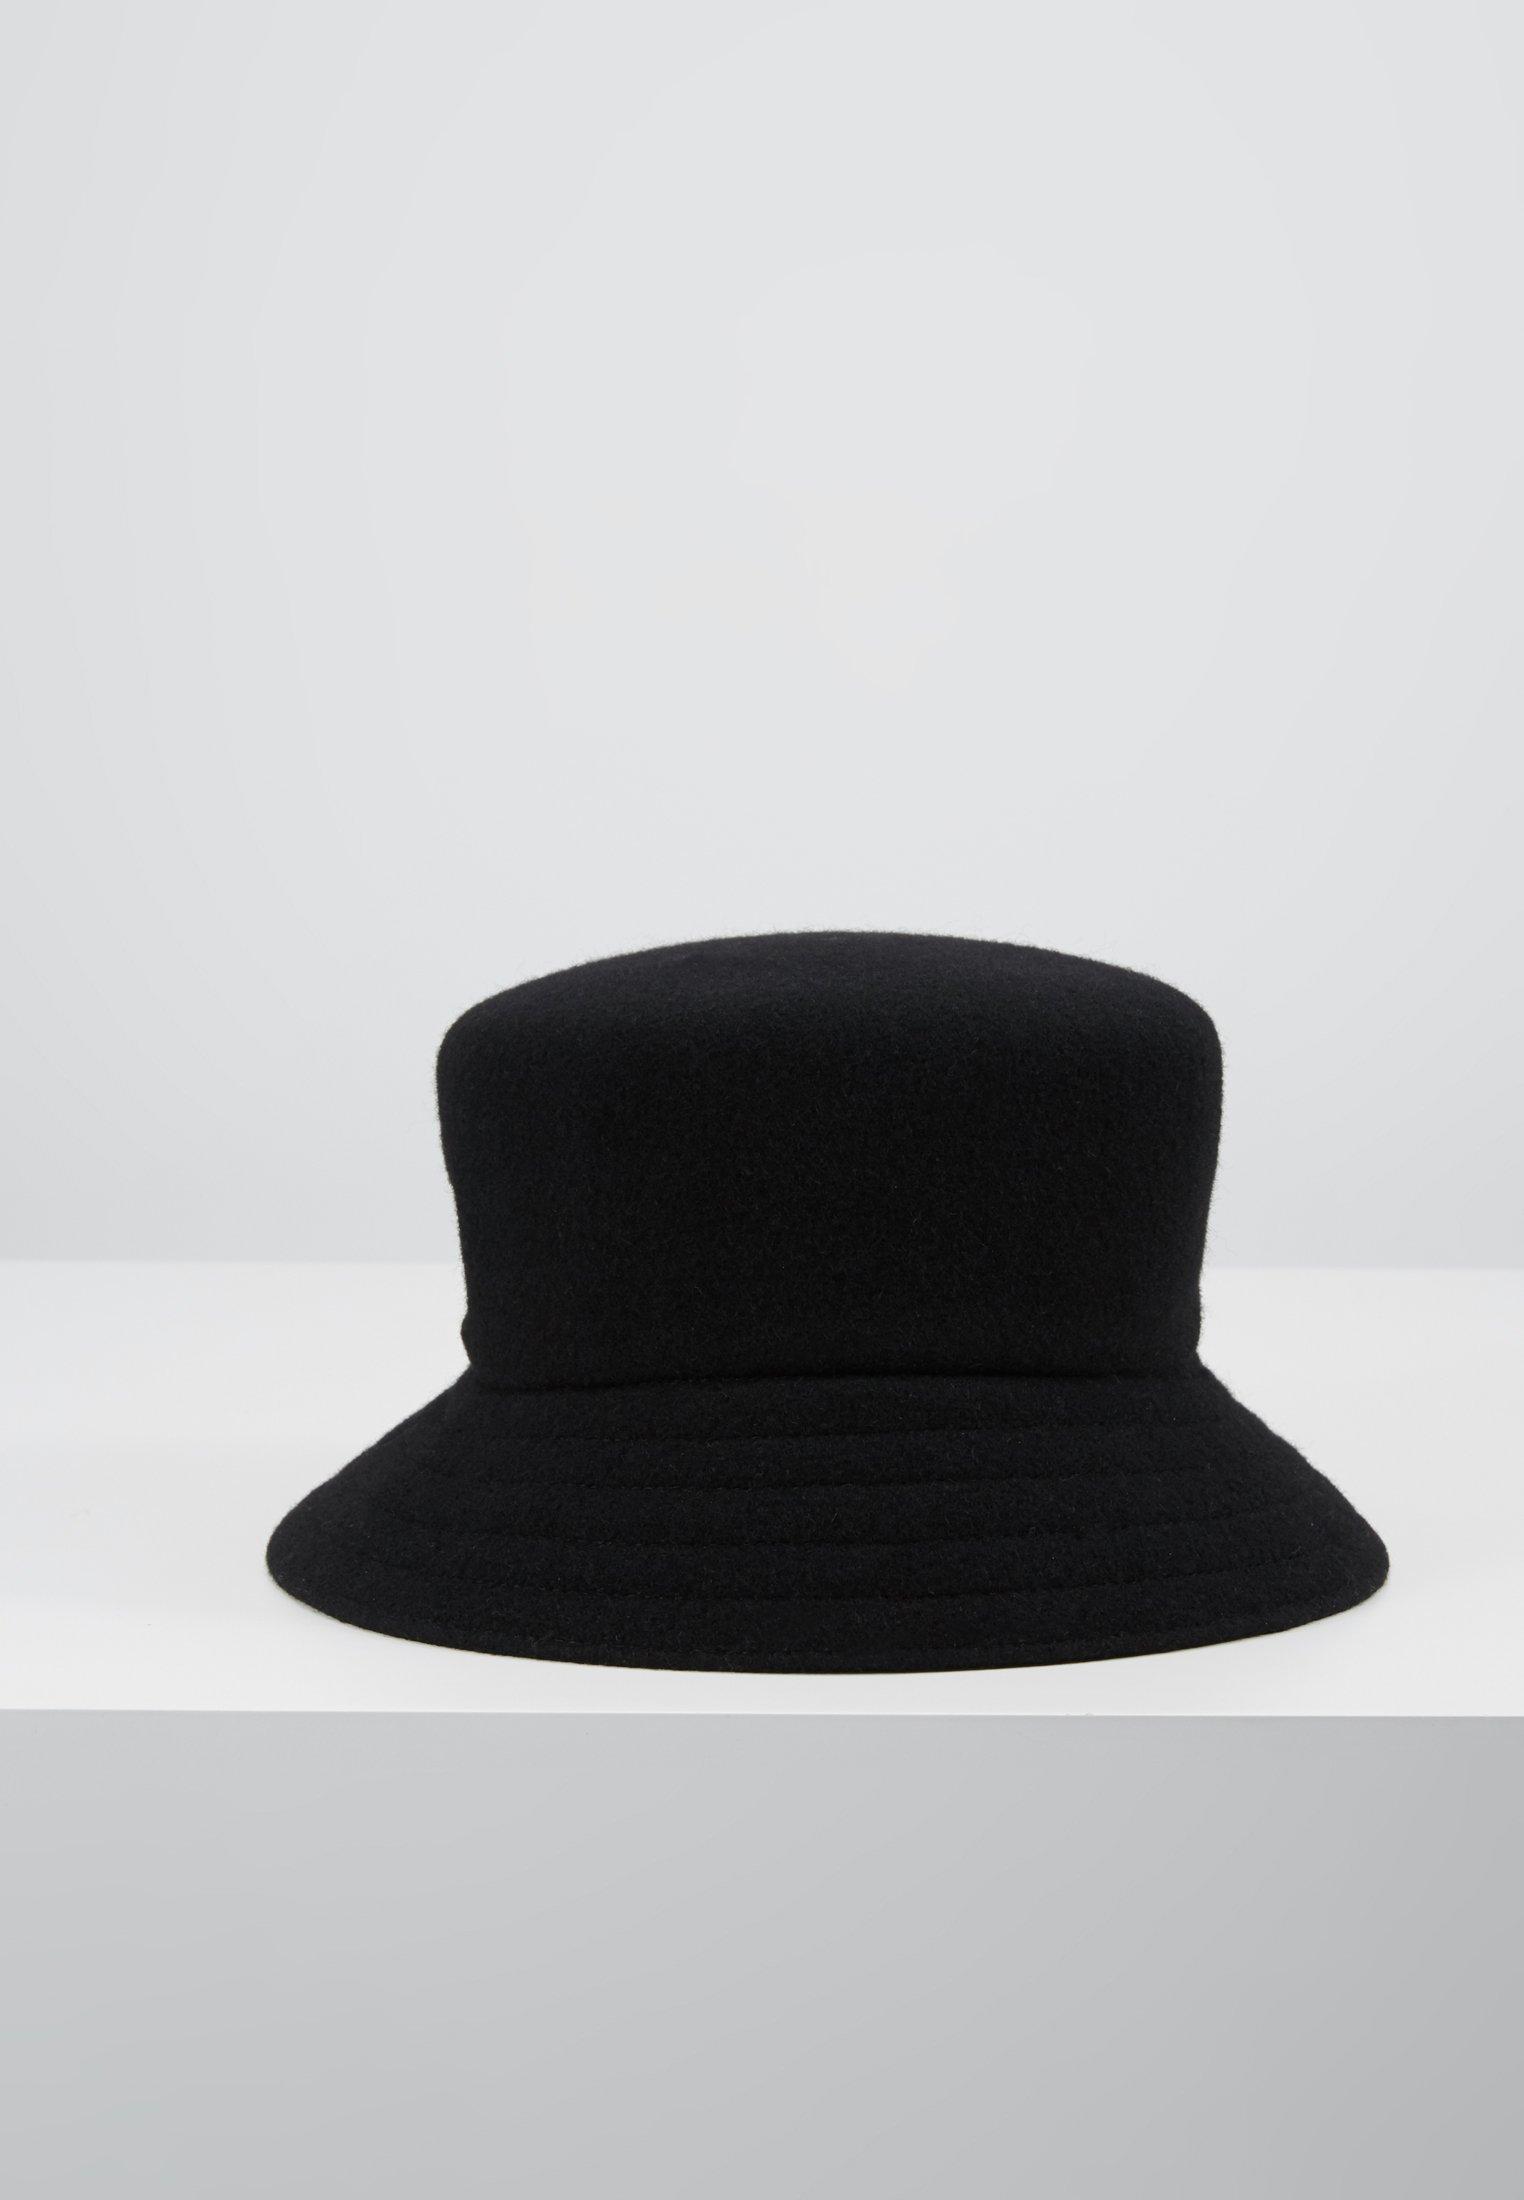 Kangol LAHINCH - Hatt - black/svart fdUOVEZwJROYuS6